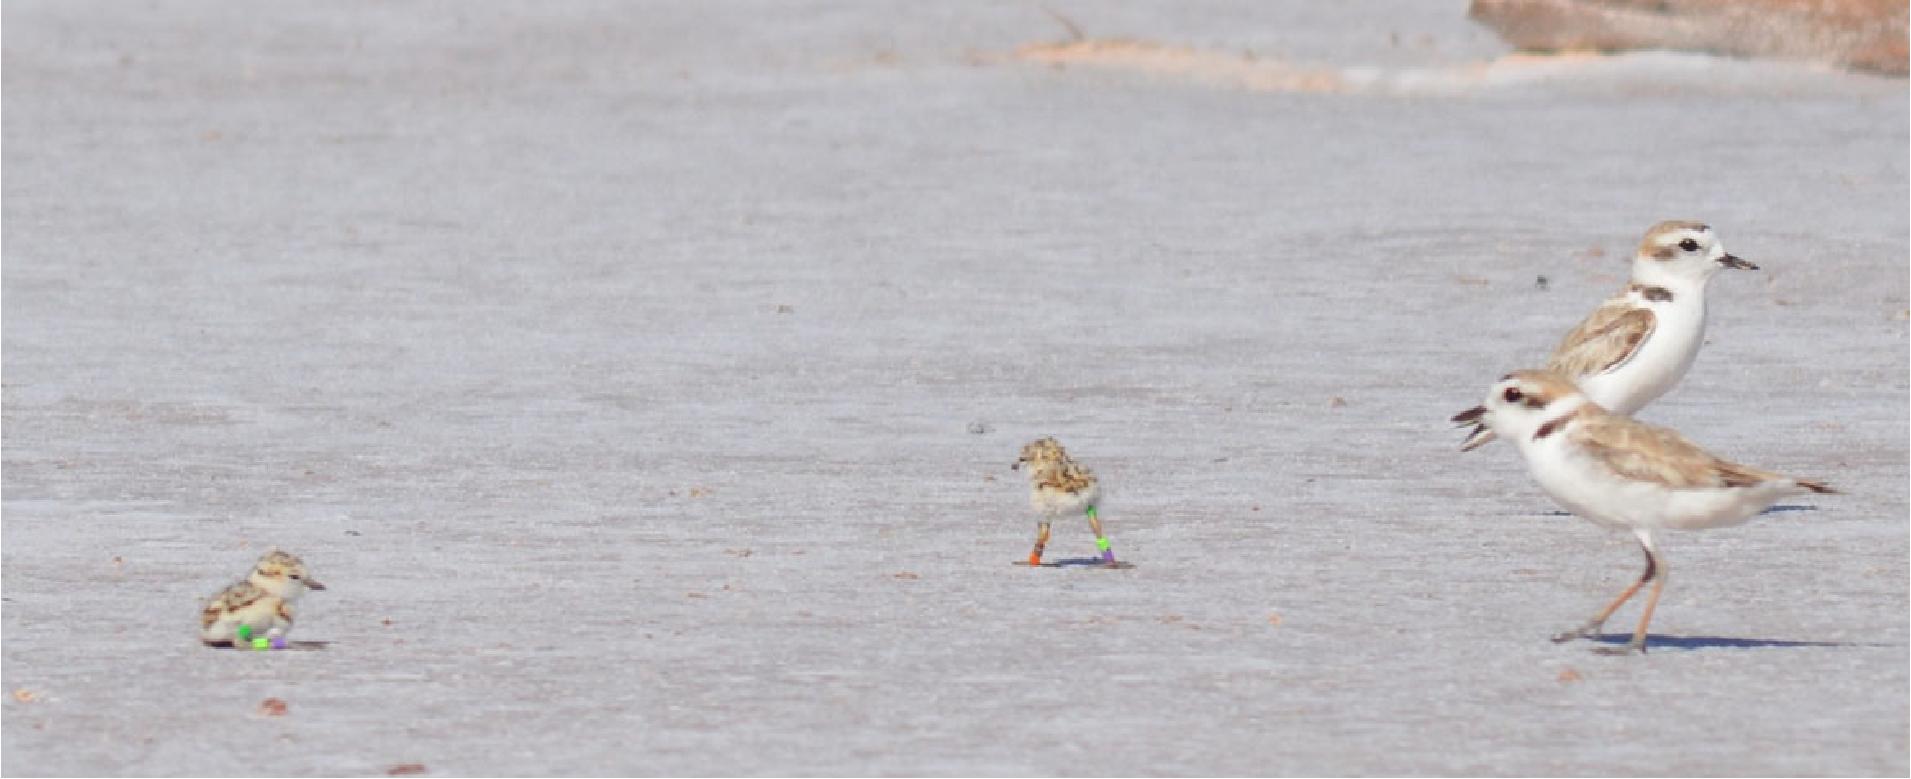 Photo: Snowy Plovers and chicks at Salt Plain National Wildlife Refuge (credit: Glen Hensley;https://whsrn.org/whsrn_sites/salt-plains-nwr/).